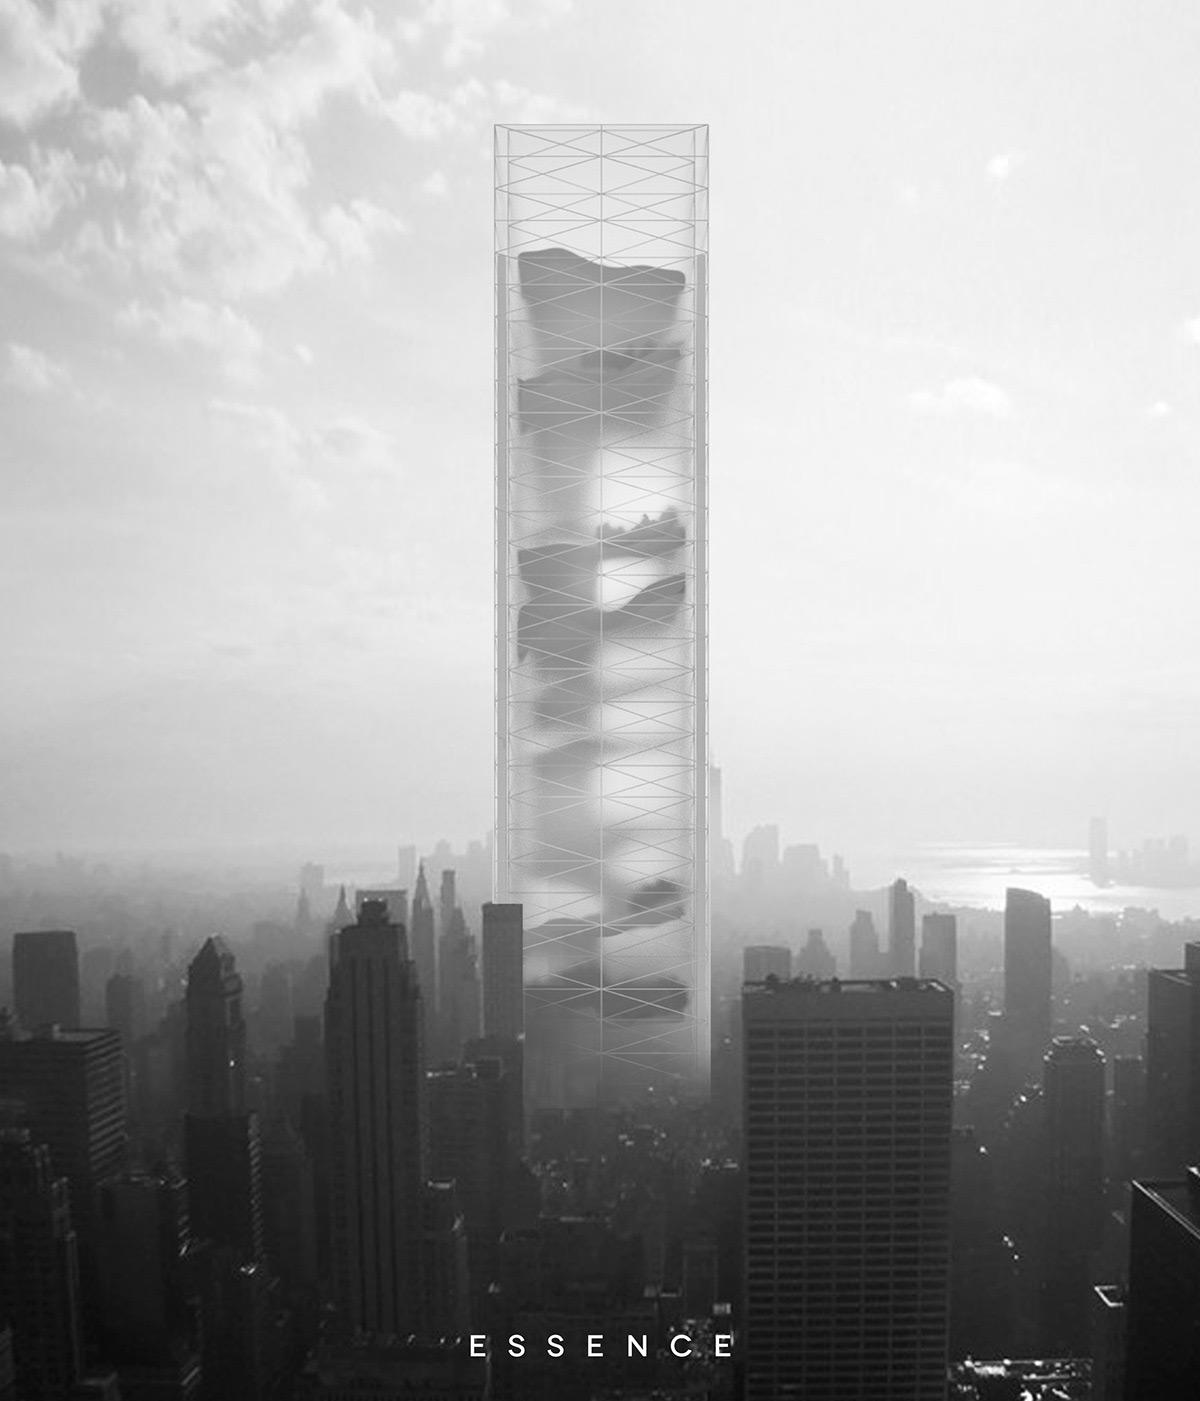 Essence Skyscraper - Urban Mega-Structure With 11 Landscapes